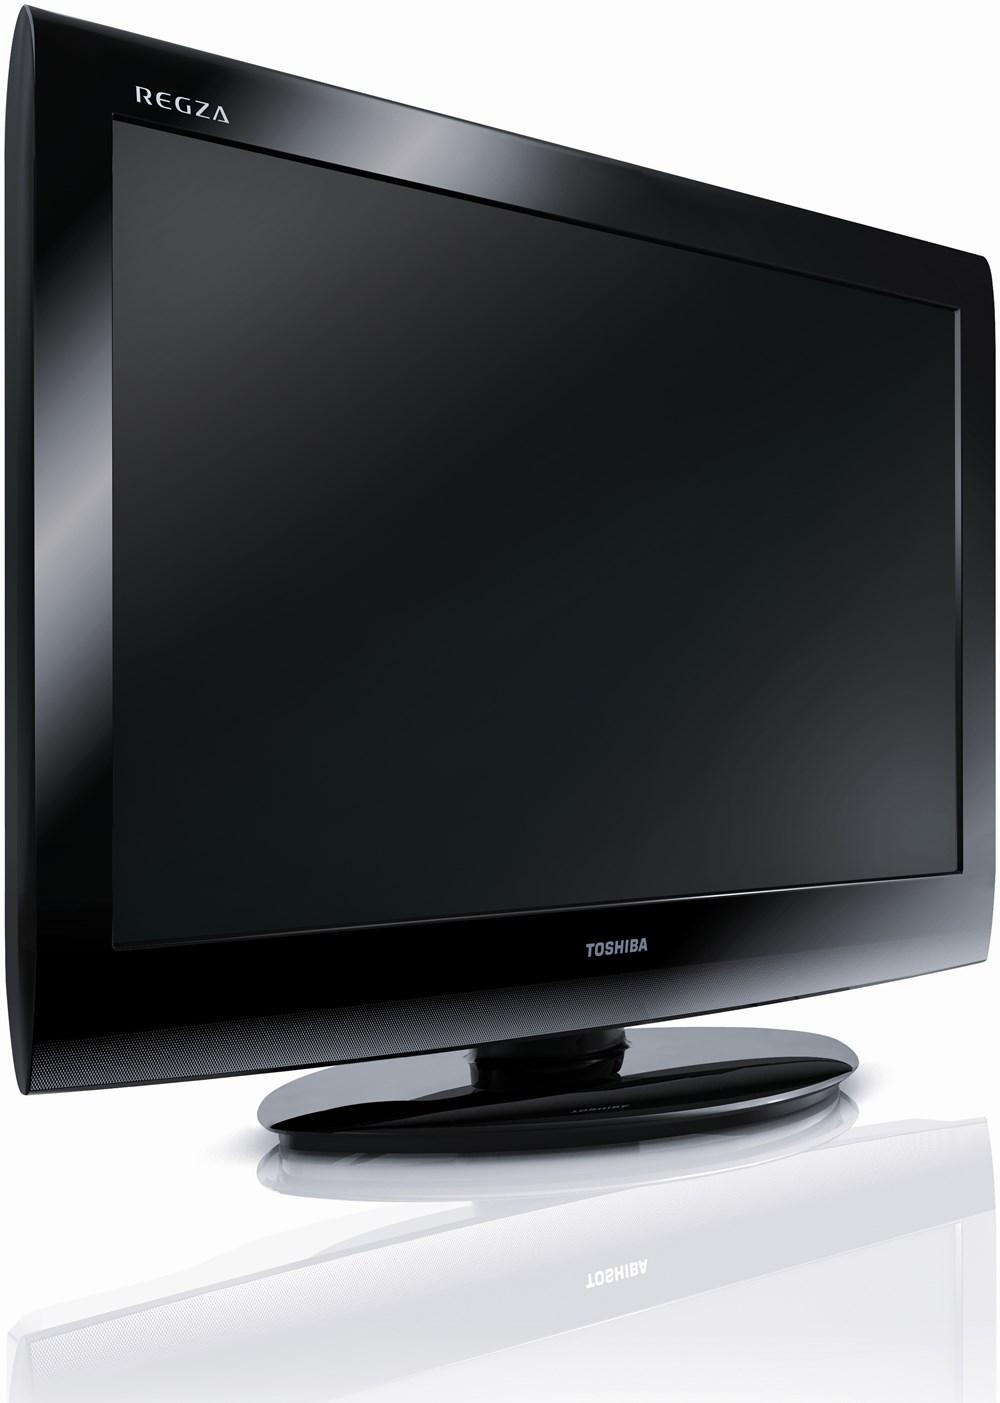 toshiba regza 40lv733g fernseher tv computeruniverse. Black Bedroom Furniture Sets. Home Design Ideas